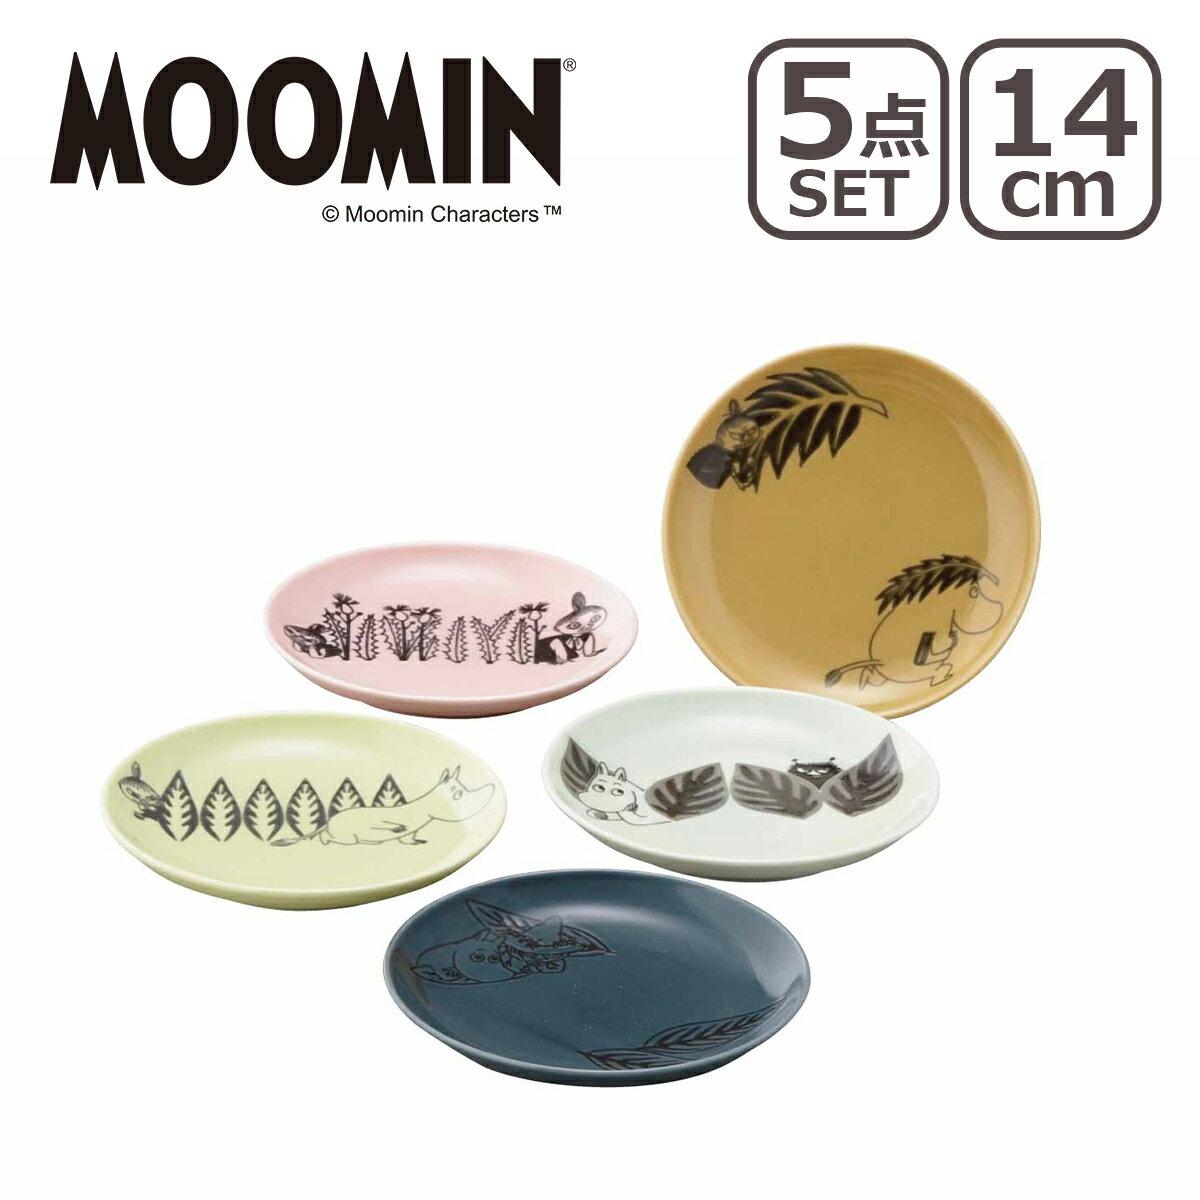 【Max1,000円OFFクーポン】MOOMIN(ムーミン)ムーミン MM2400 ファイブプレートセット ギフト・のし可